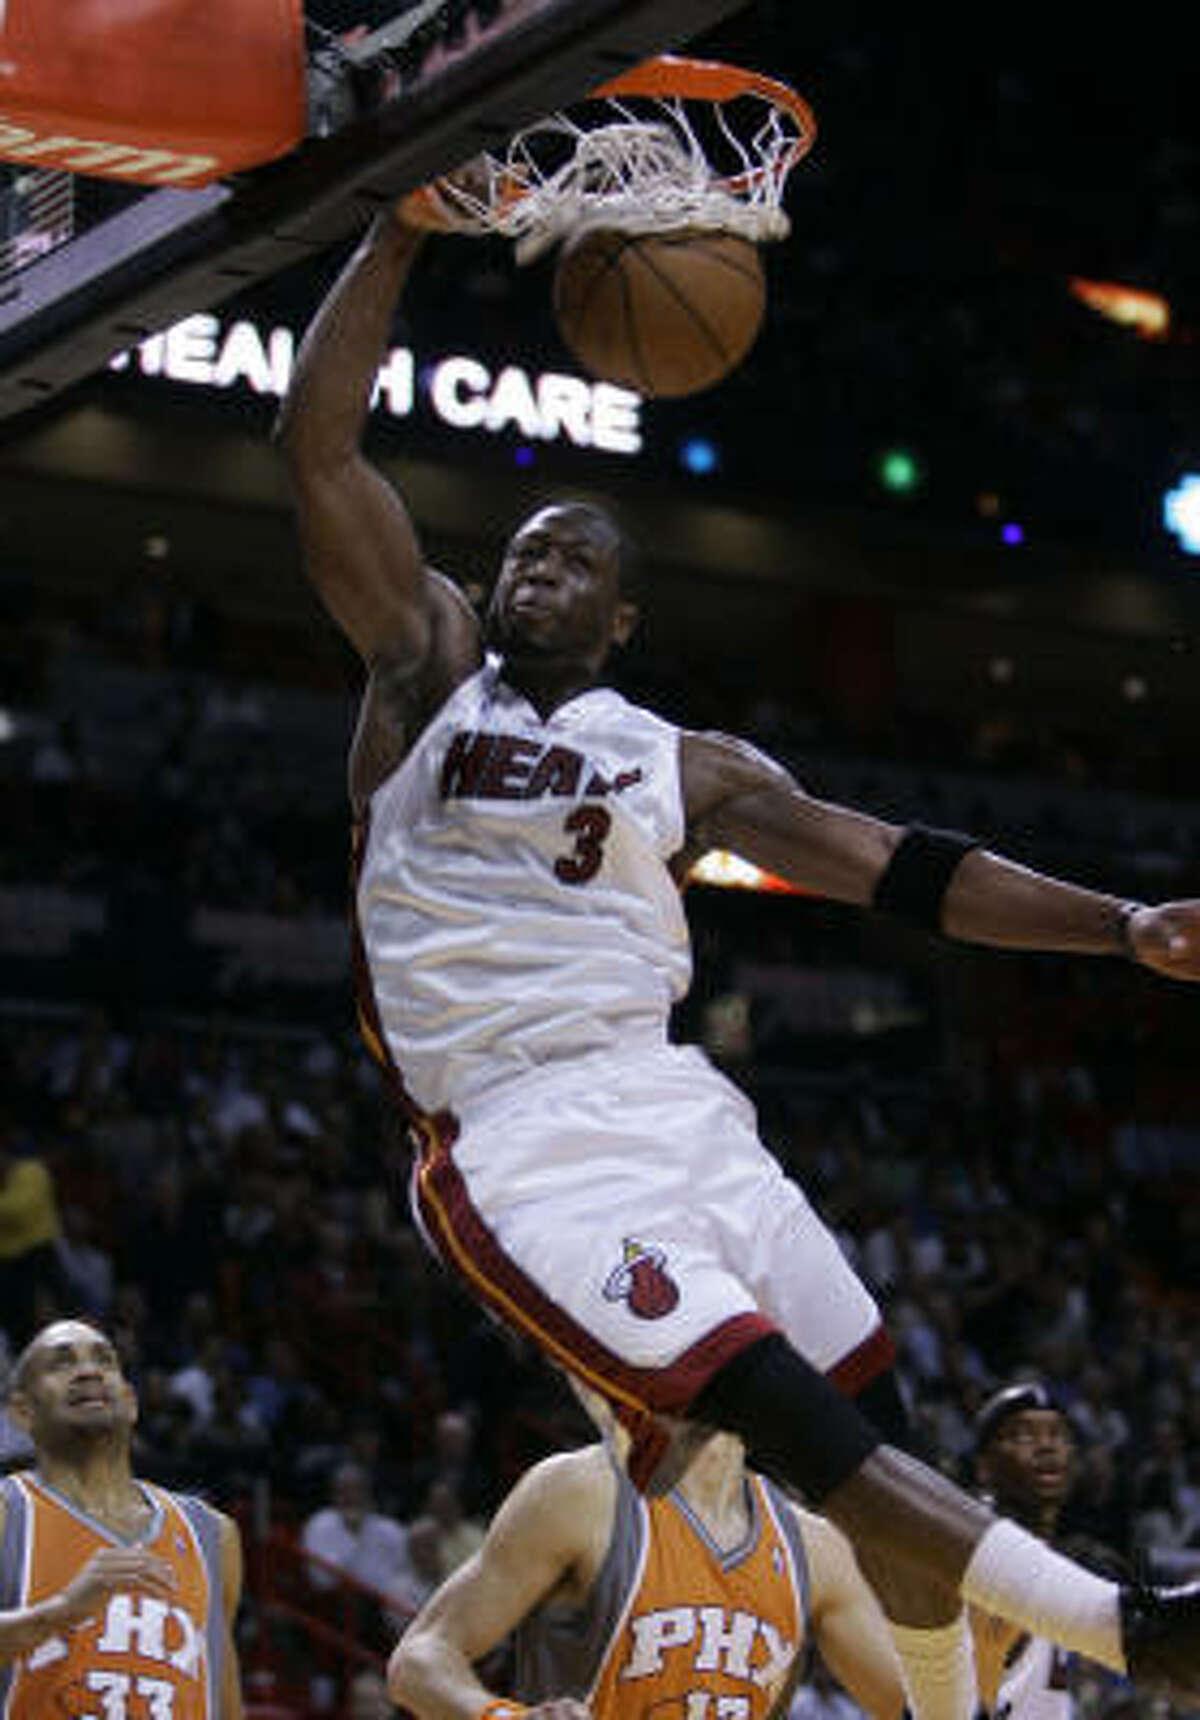 No. 1: Dwyane Wade, Miami Heat guard PPG: 29.7 Shooting percentage: 49.5